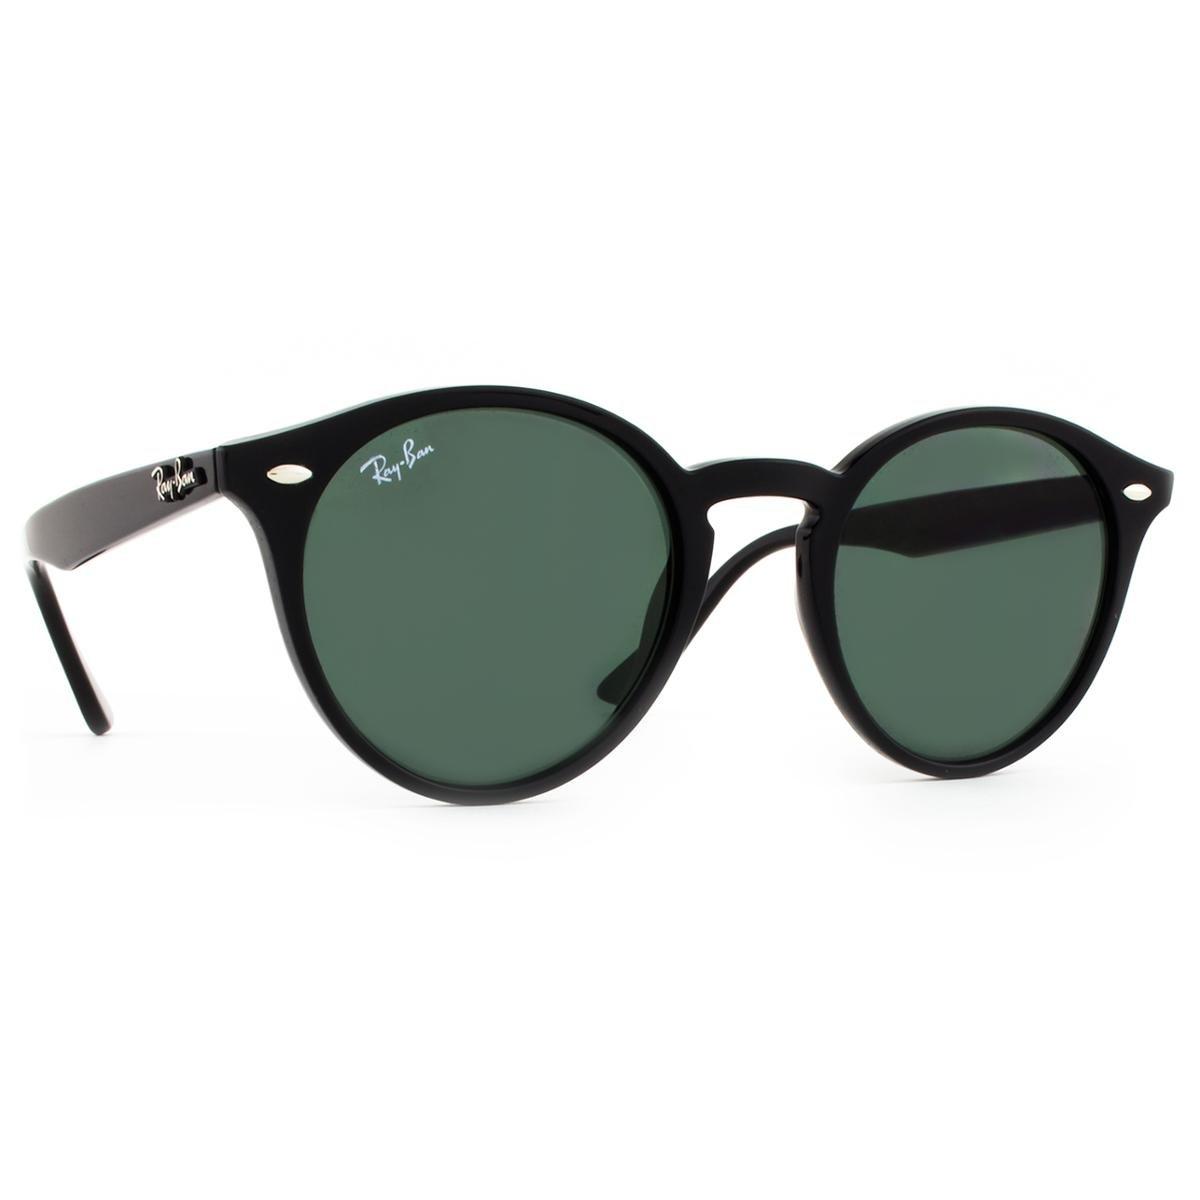 Óculos de Sol Ray Ban Round RB2180L 601 71-51 - Compre Agora   Zattini 2364d92f31